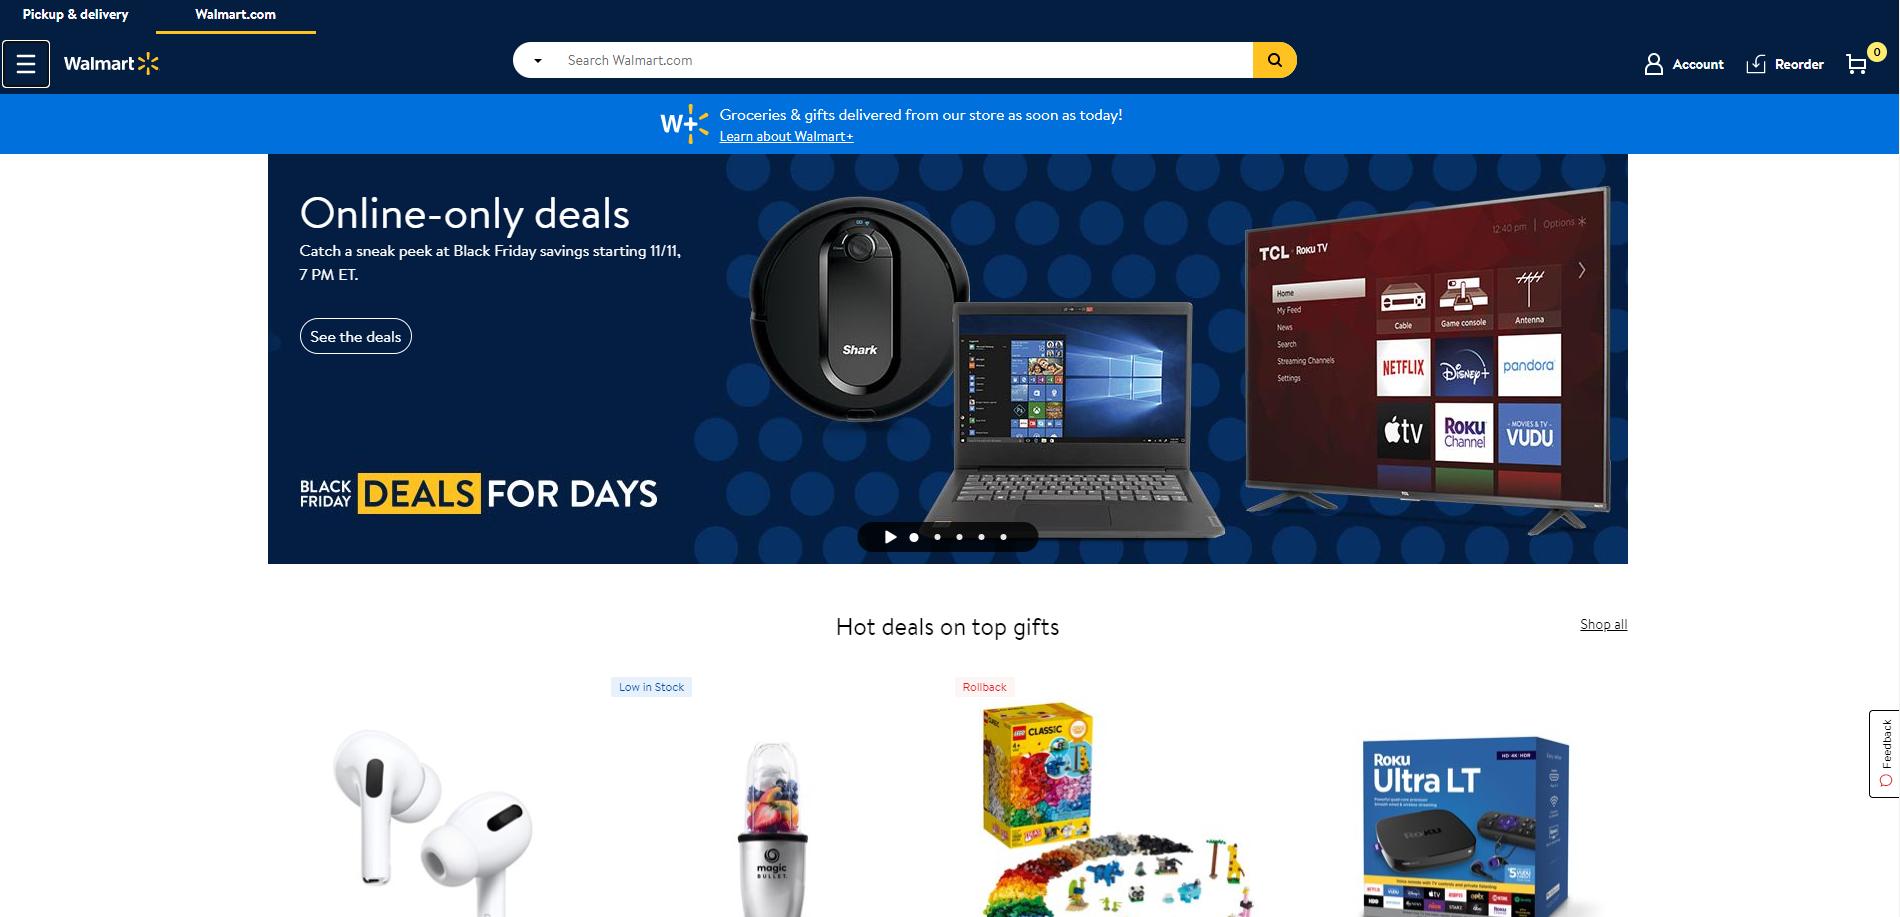 Walmart Black Friday Promotion